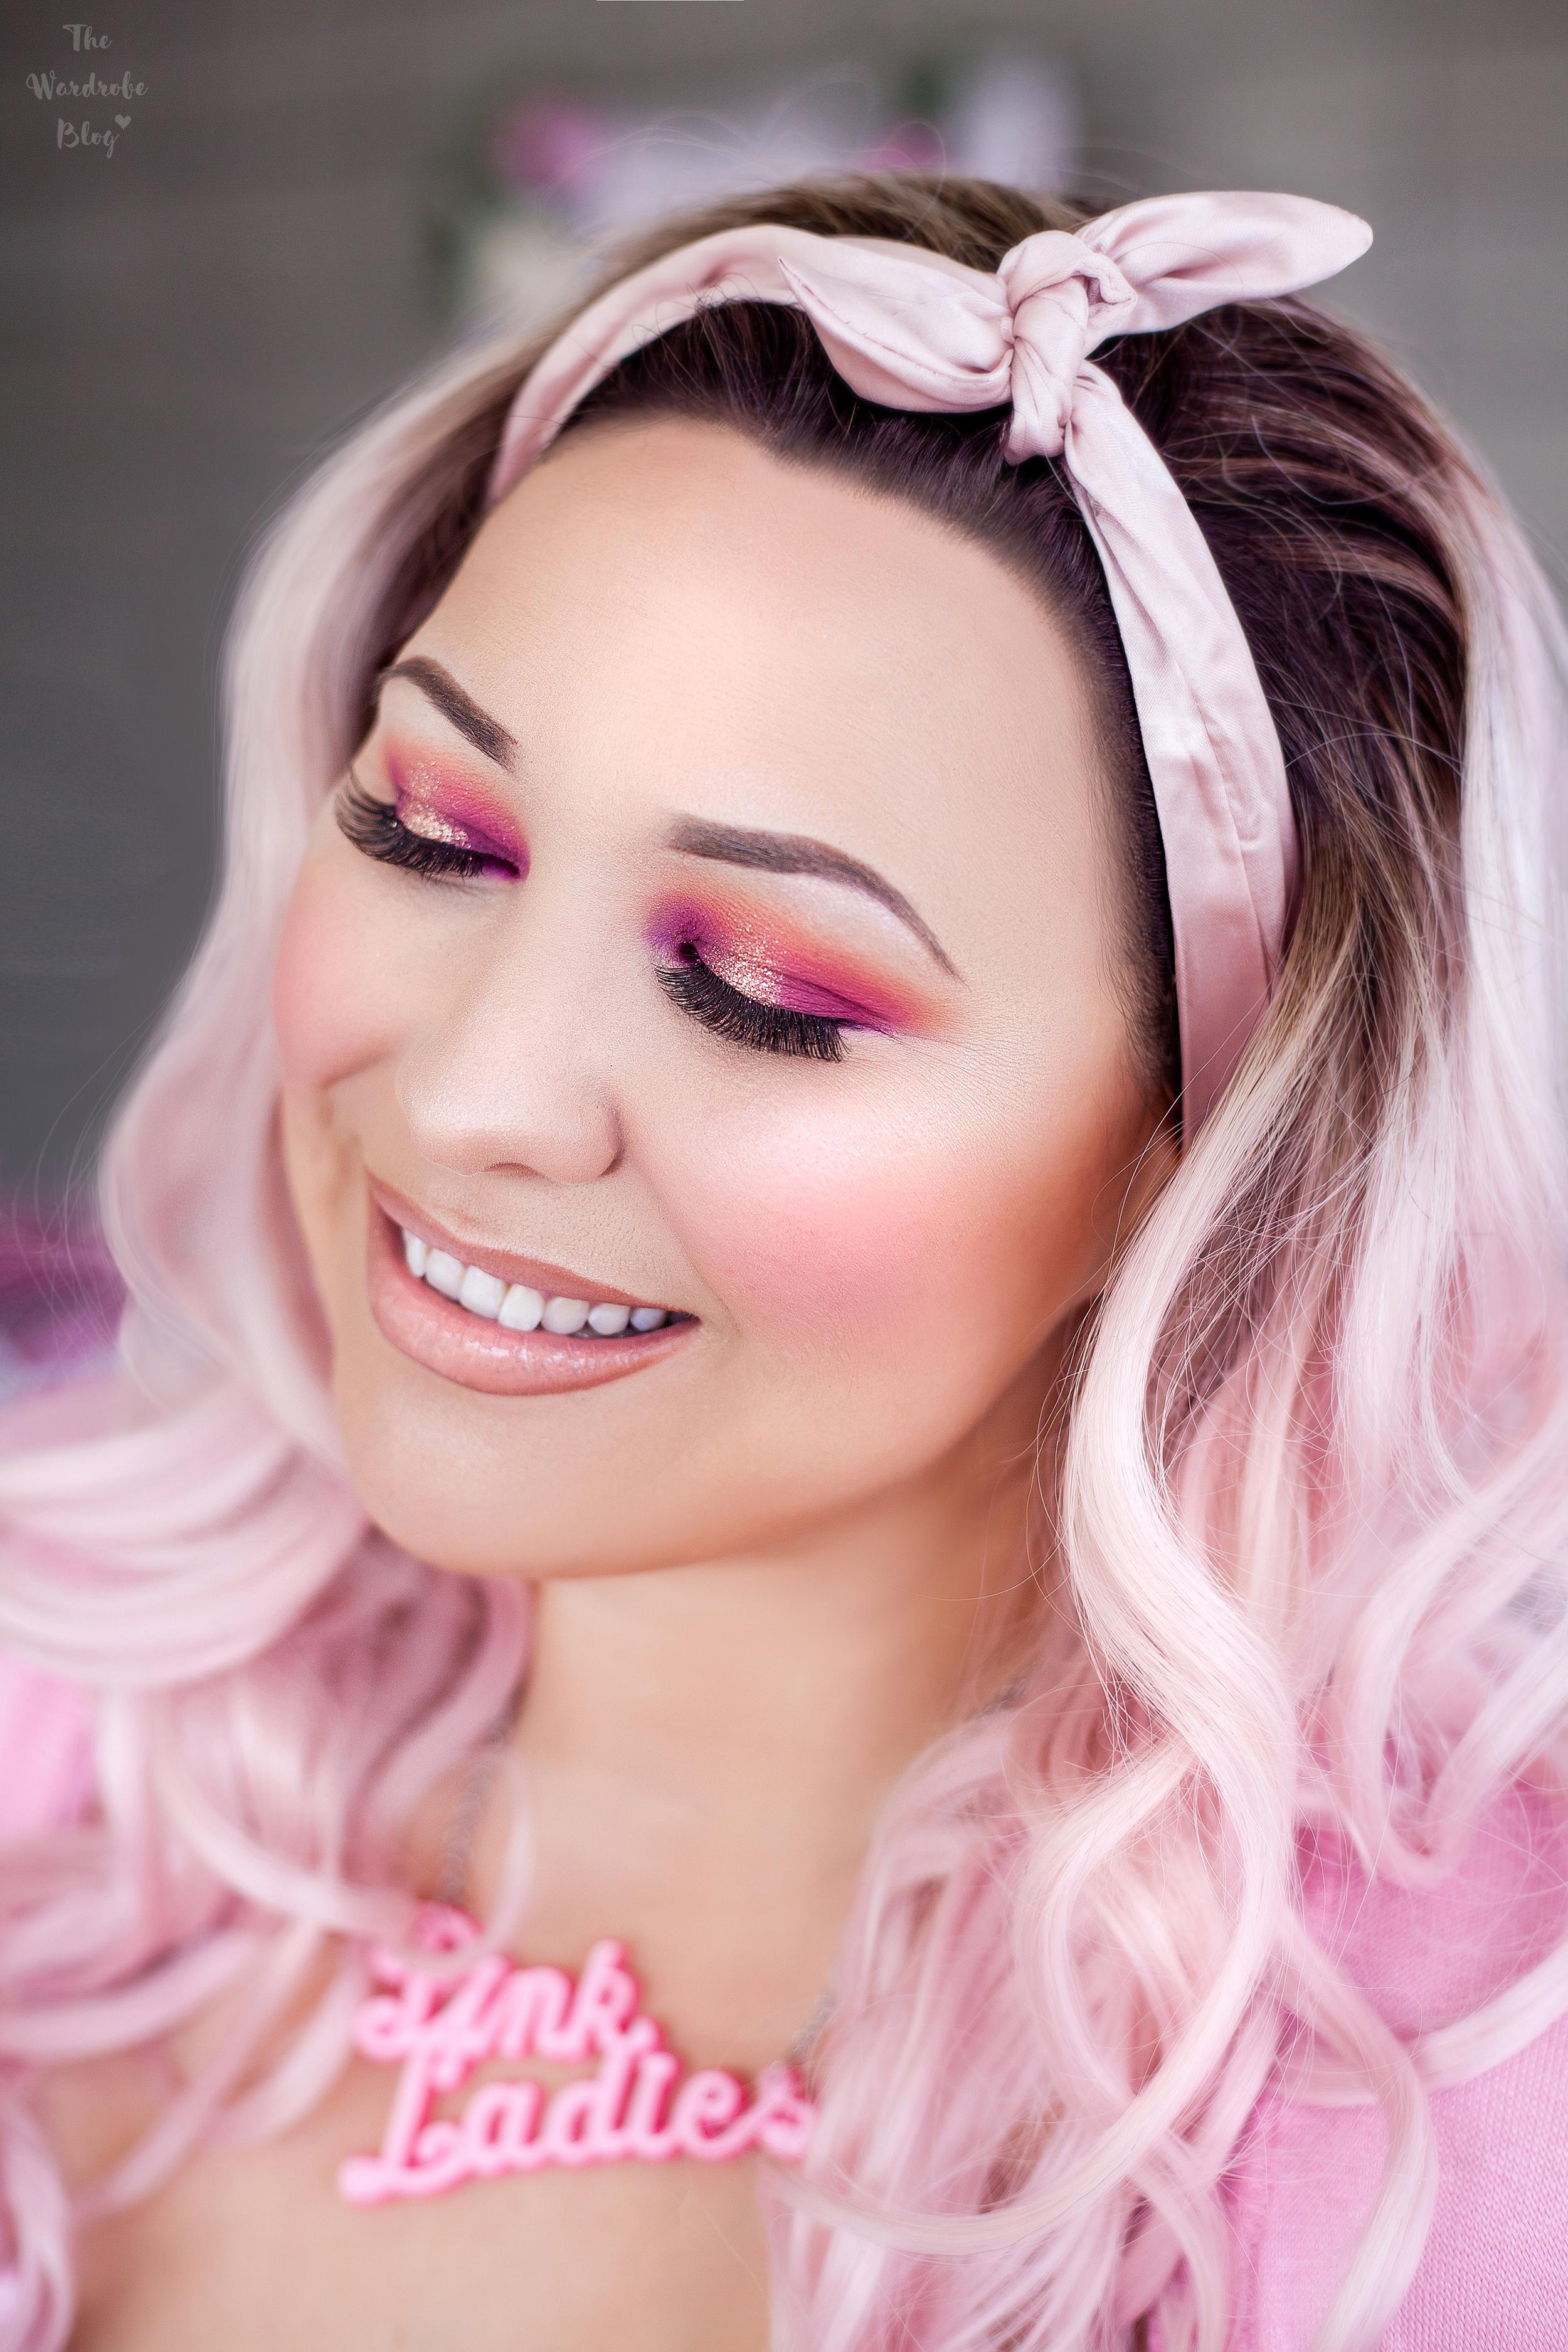 Phoenix-Renata-Cosmetics-Interview-Closed-Eyes